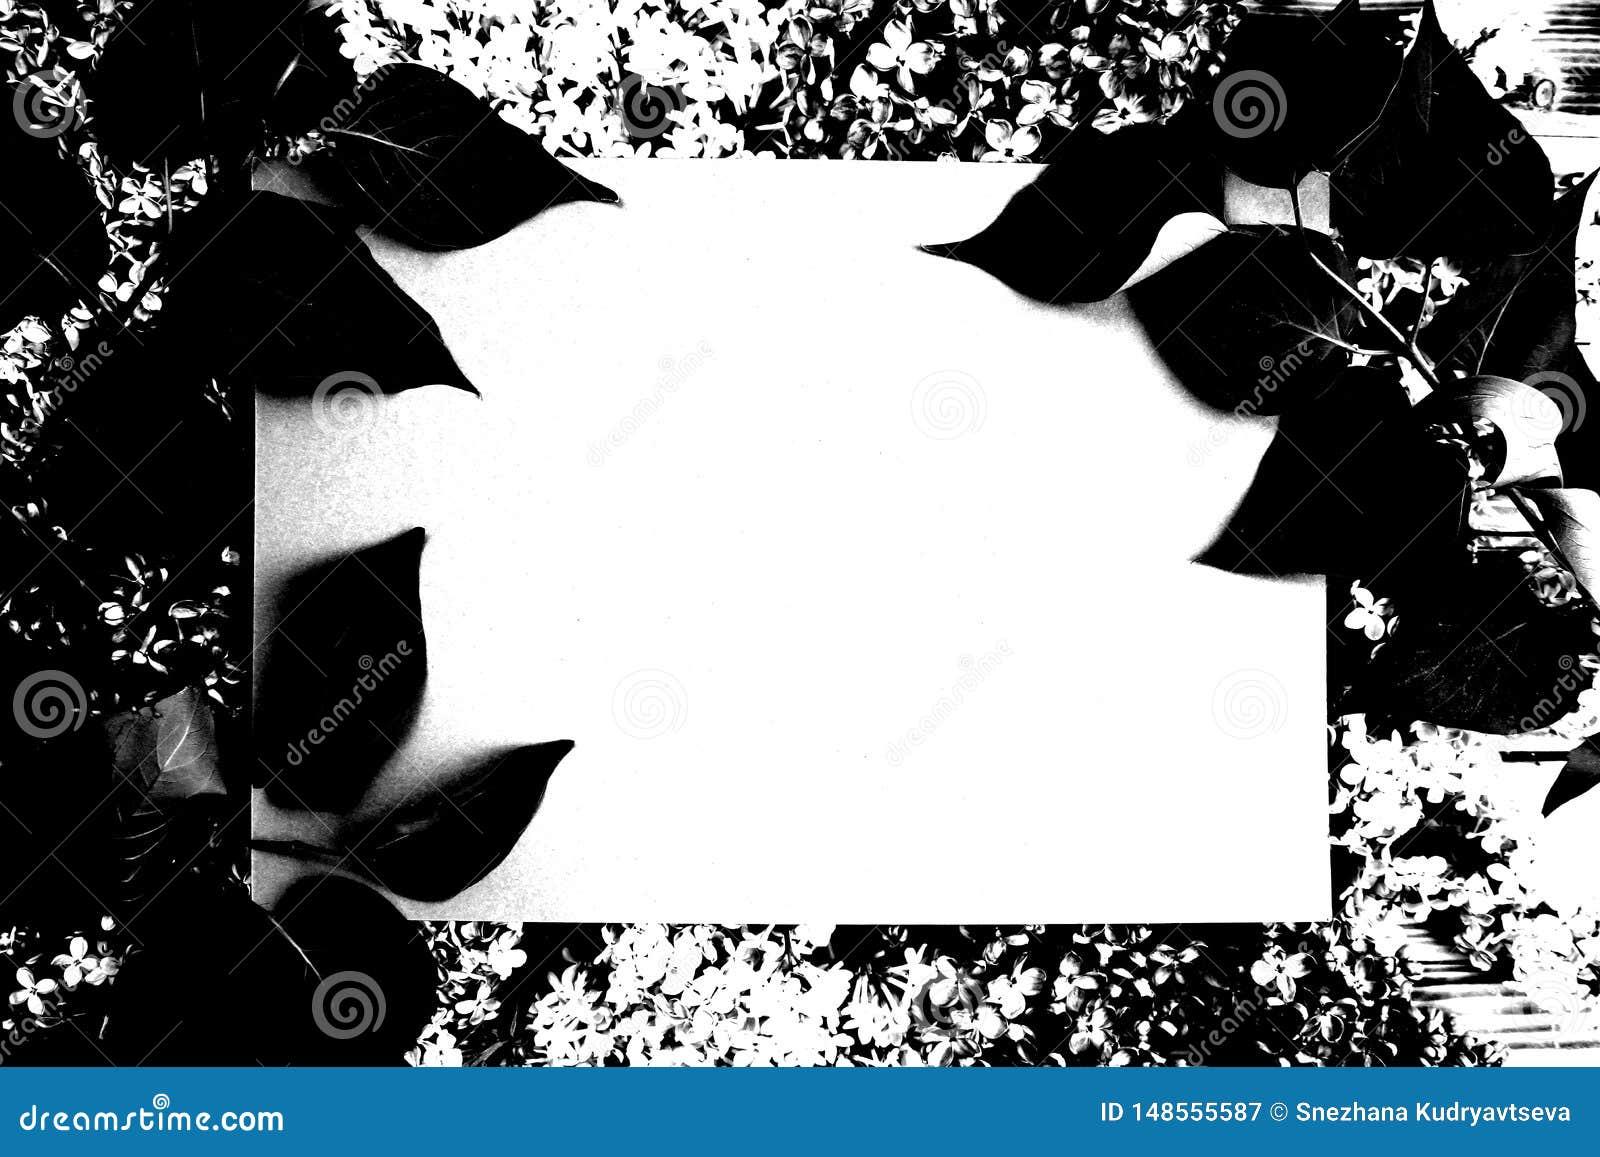 Текстурируйте рамку фото листьев темного черно-белого